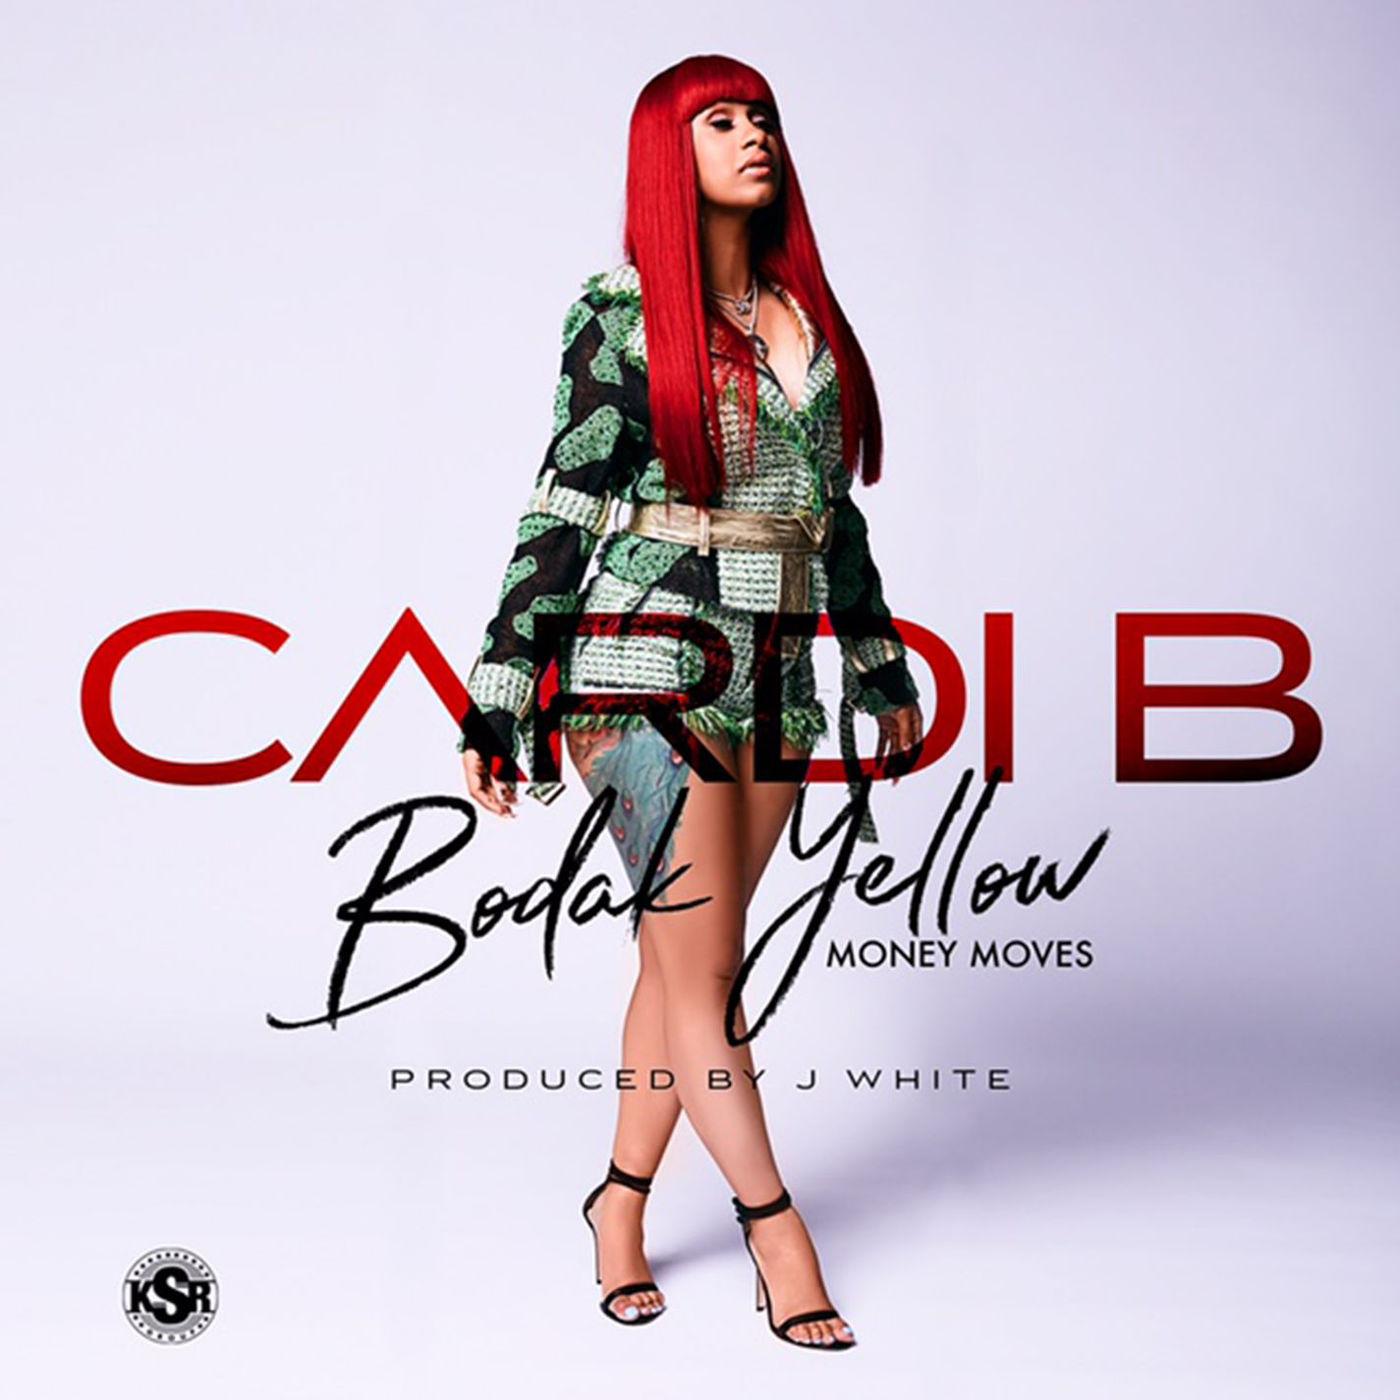 Cardi+B+-+Bodak+Yellow.jpg